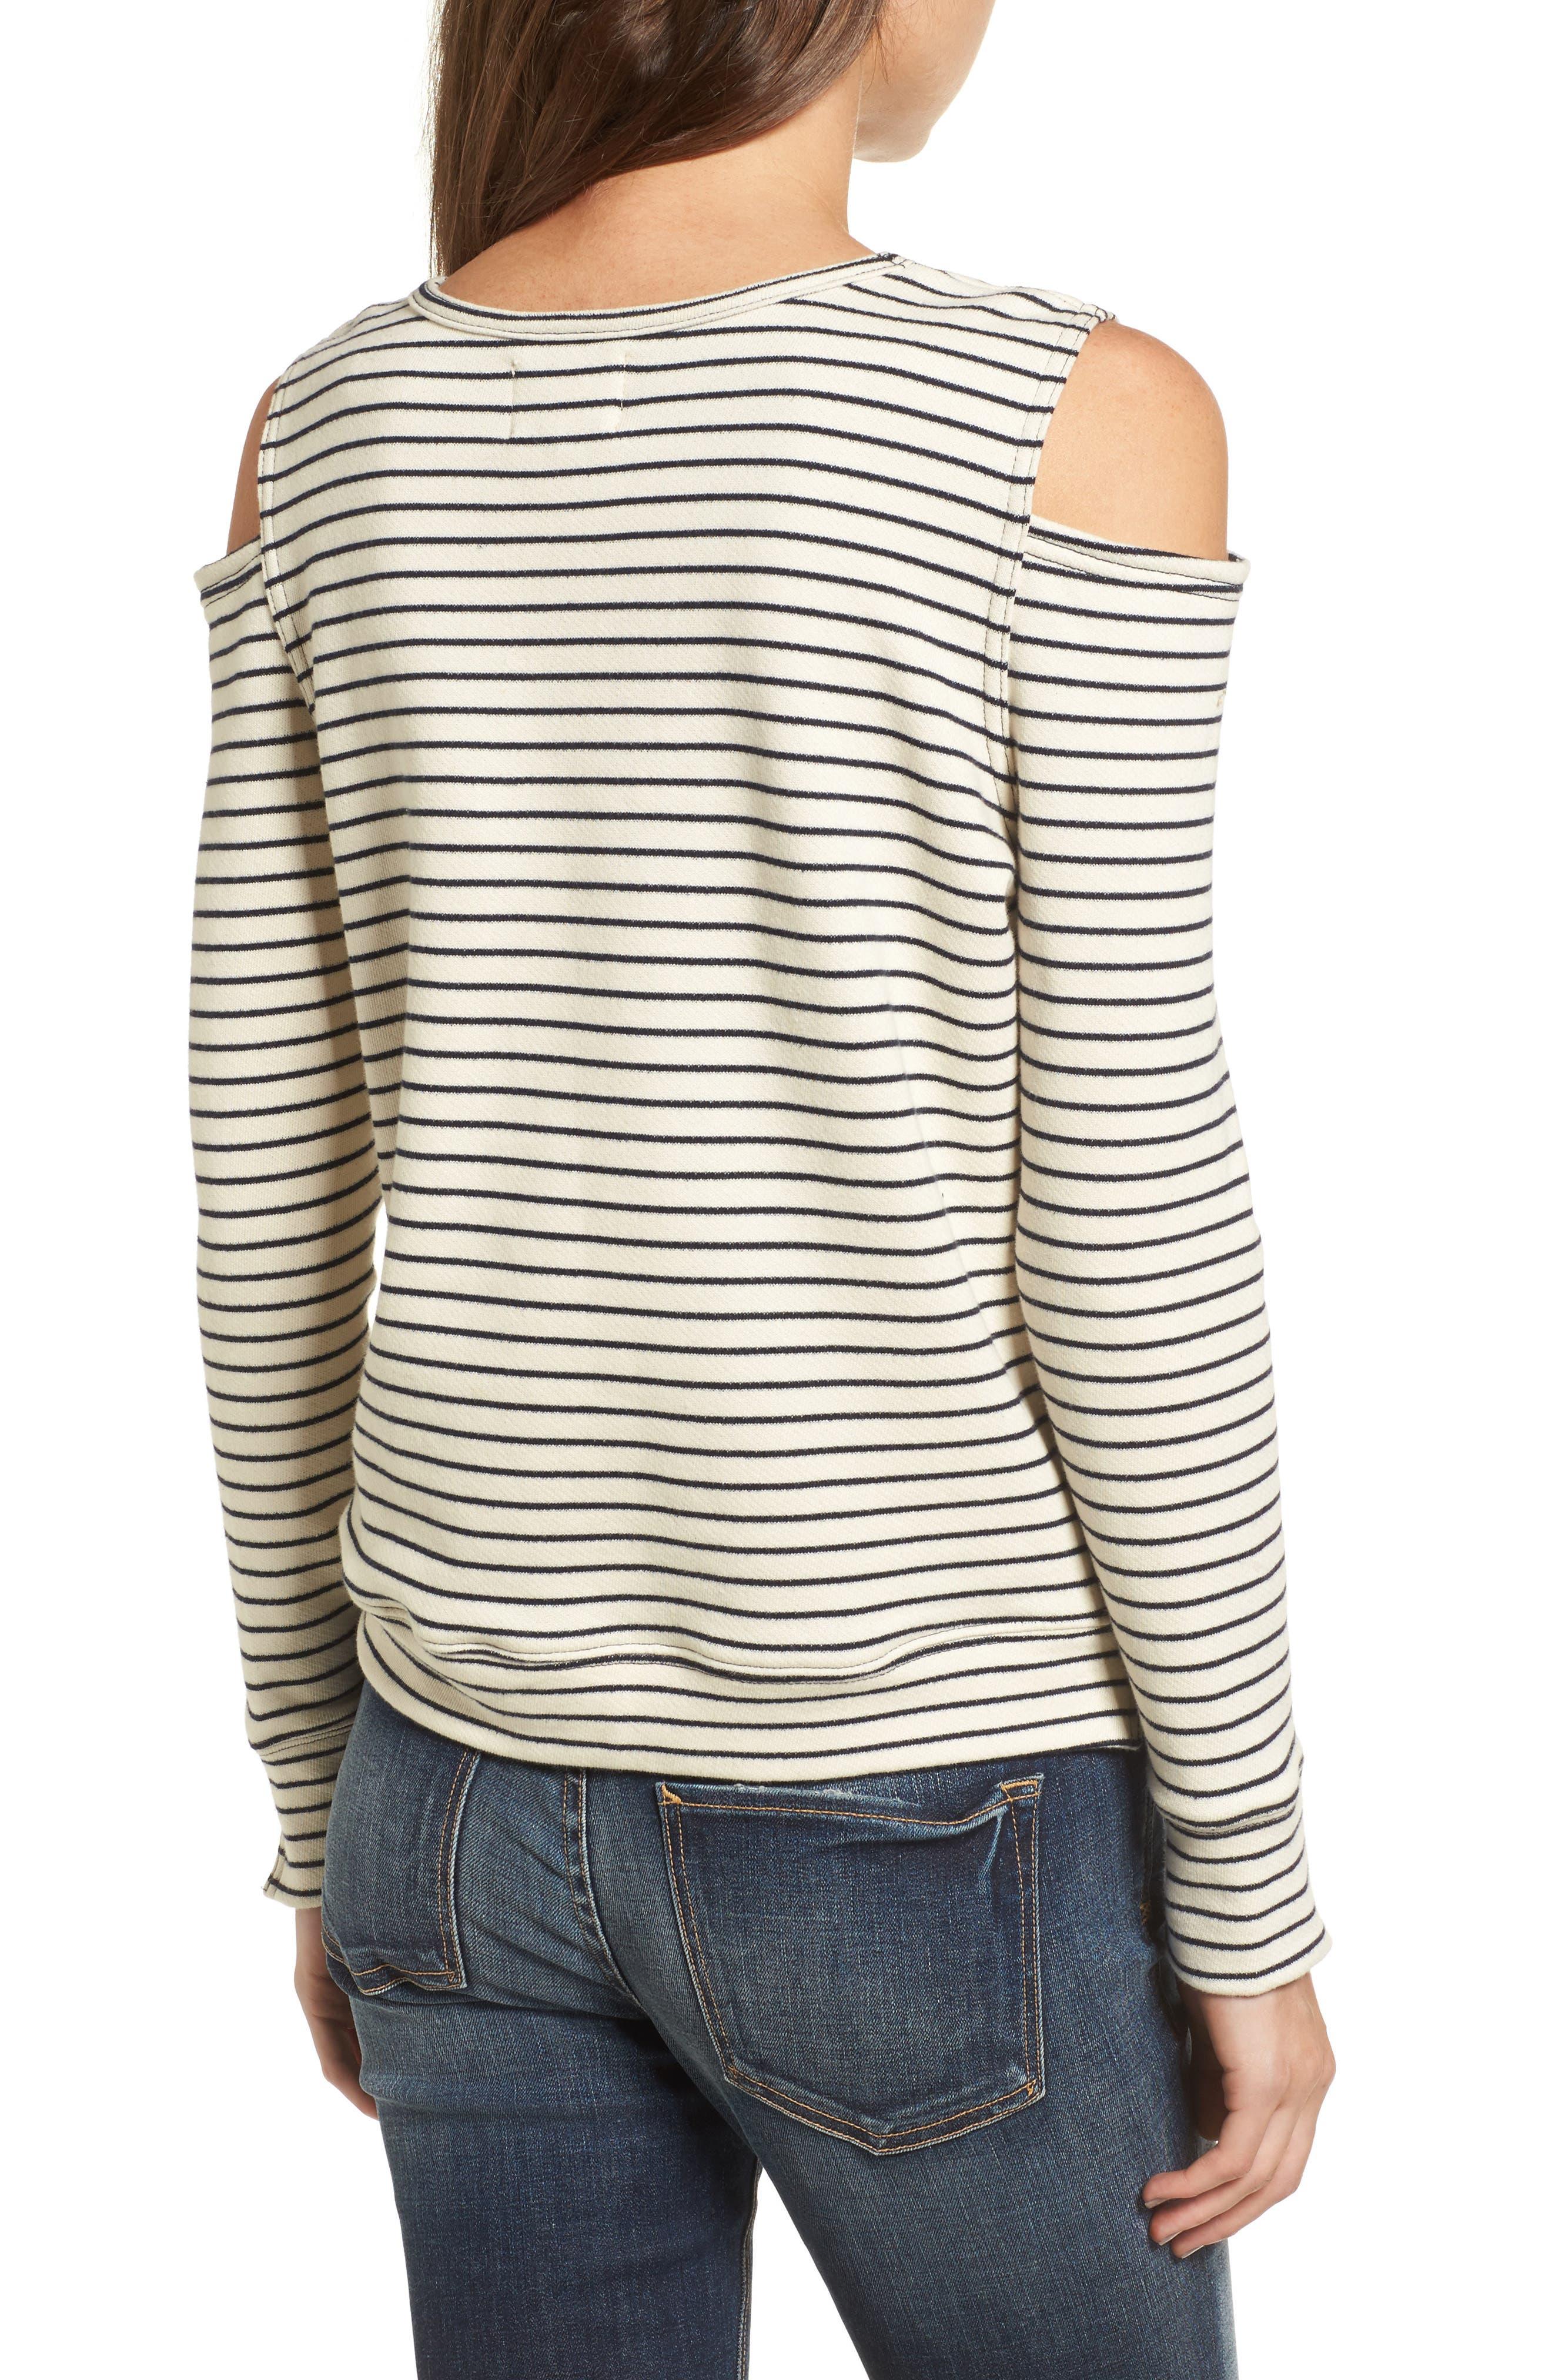 Wildair Cold Shoulder Sweatshirt,                             Alternate thumbnail 2, color,                             Ski Stripe